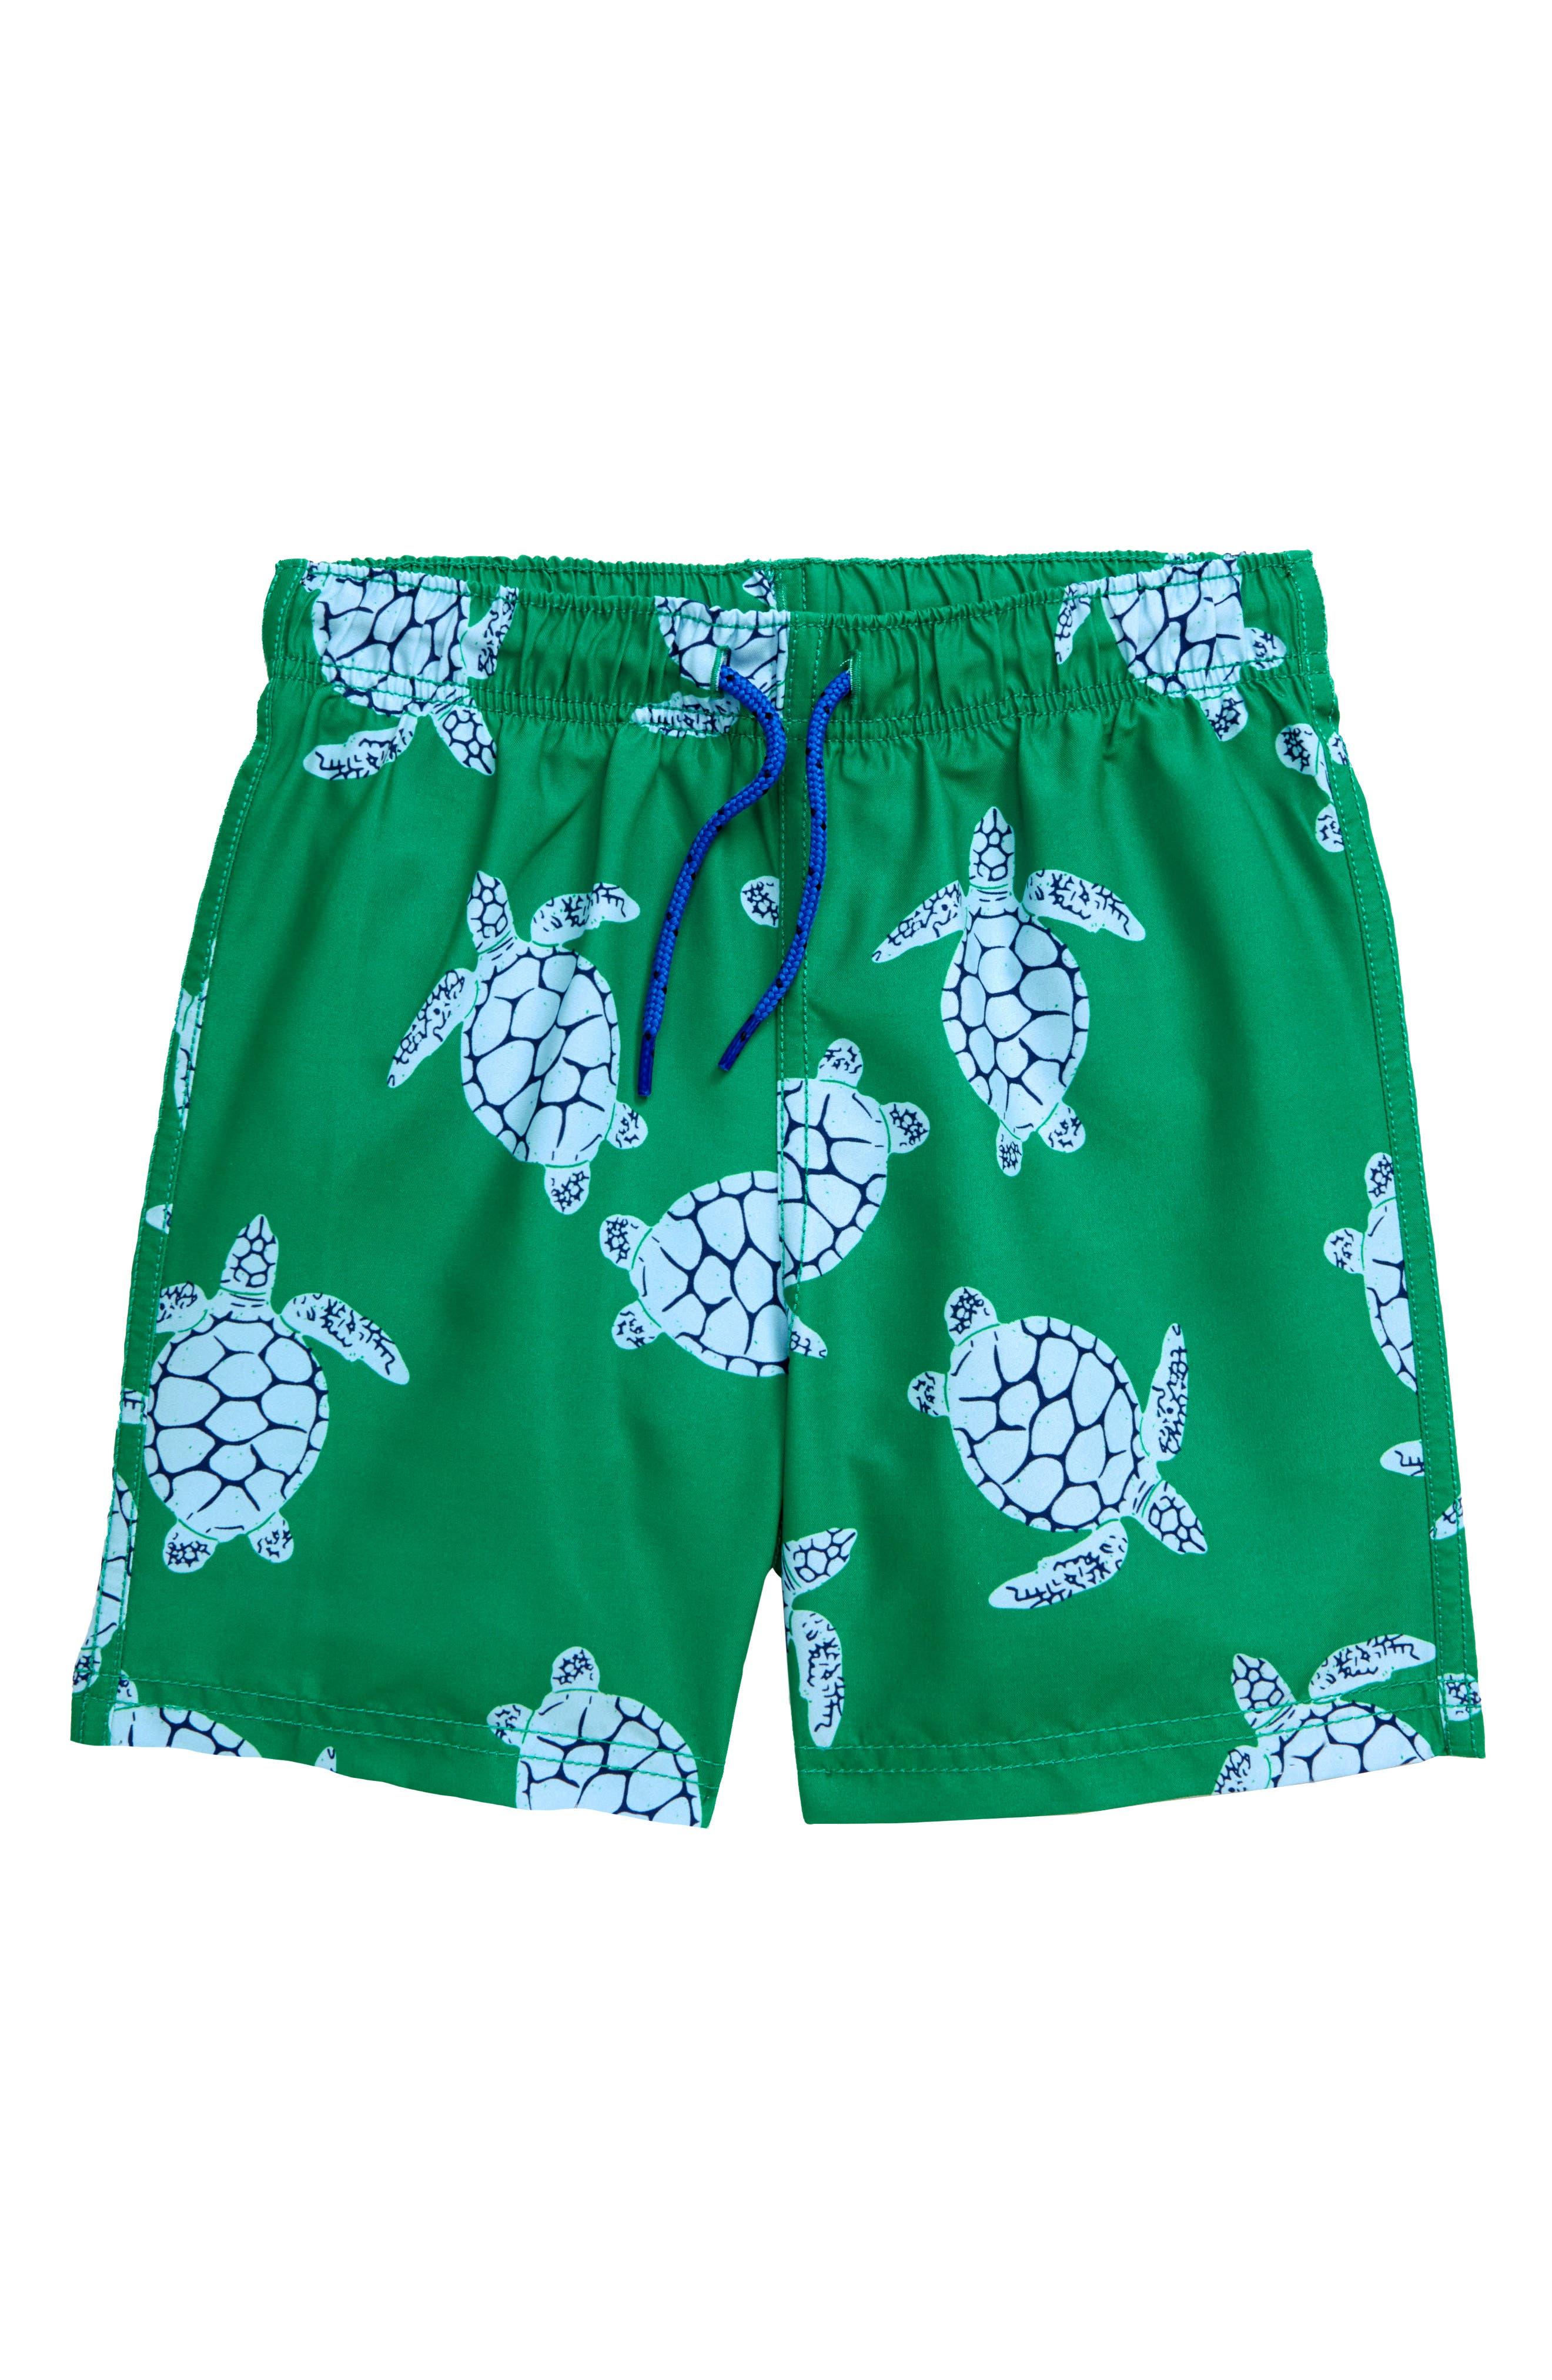 Women Turtle Print Art Athletic Beach Shorts Board Shorts Pants